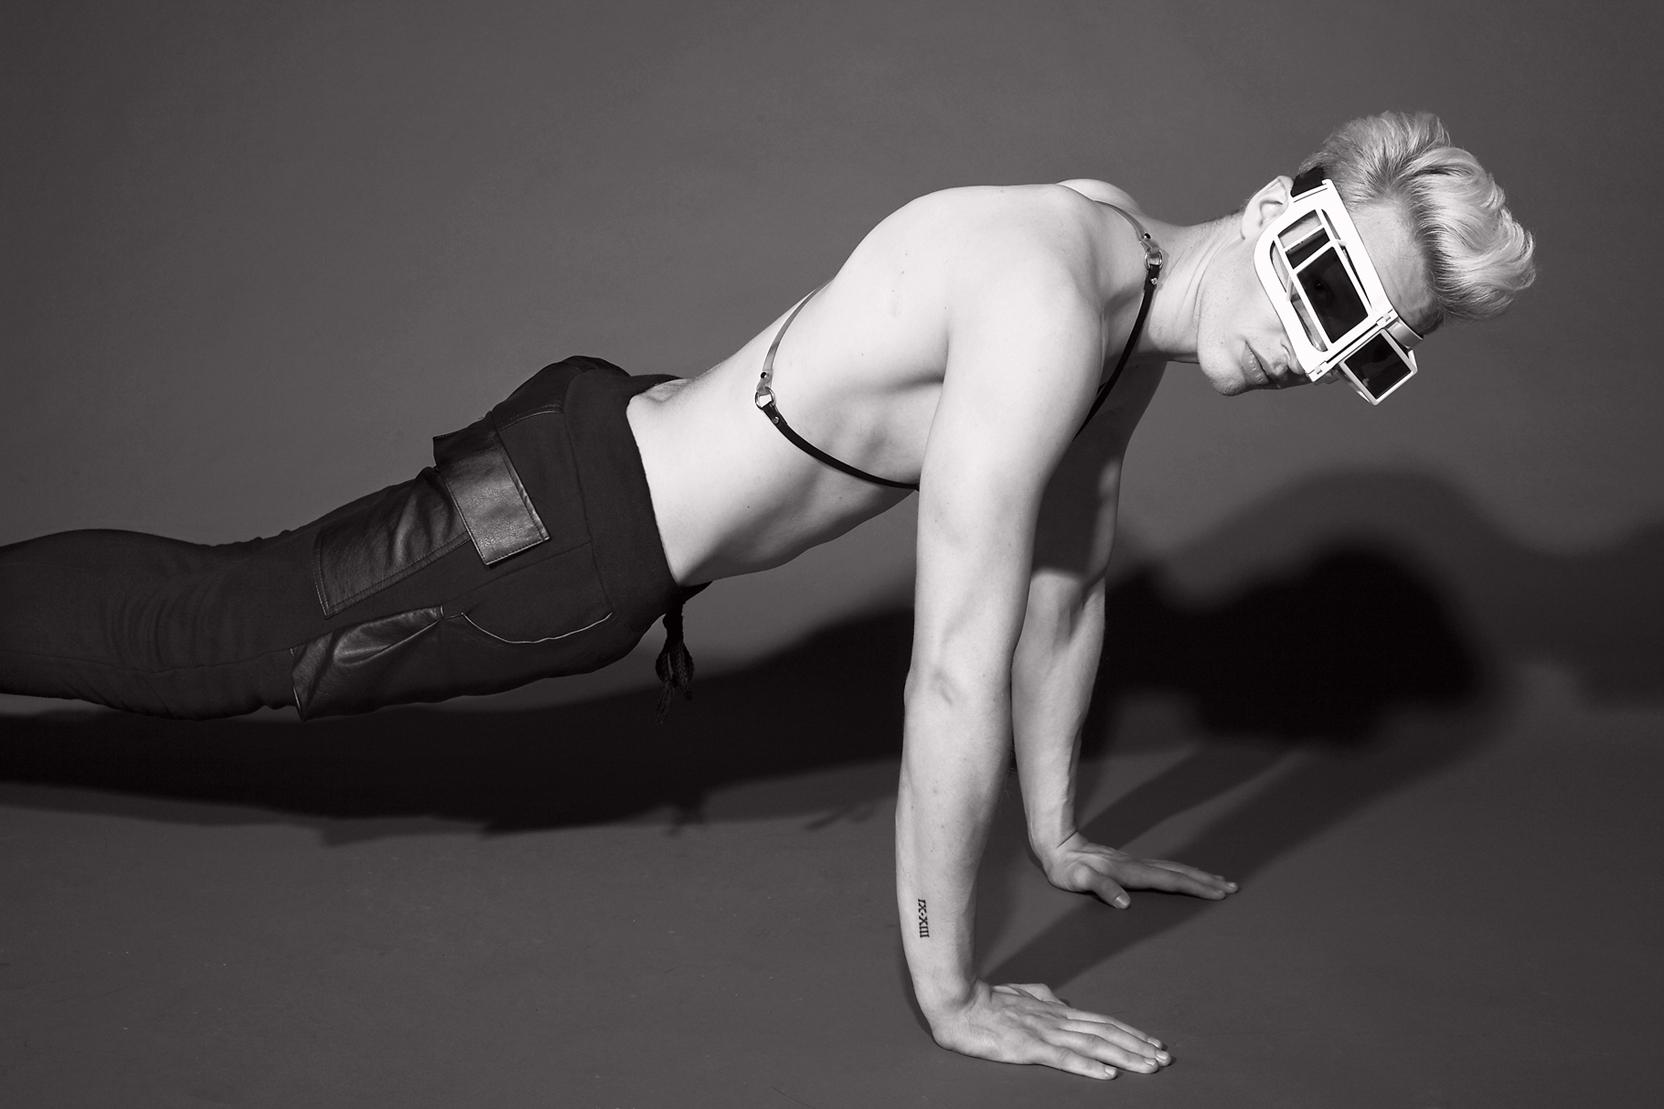 Harness  Nouveau, Pants  Cody Ross, Shoes & Sunglasses  KTZ           photographer  Barry Hollywood   grooming  paul venoit@wilhelmina nyc   stylist  carlos davis   male models   tyler james @ qmanagement nyc    jan avehard @ nymodels nyc    ian sheridan @ nymodels nyc    luca schmitz @ nymodels nyc